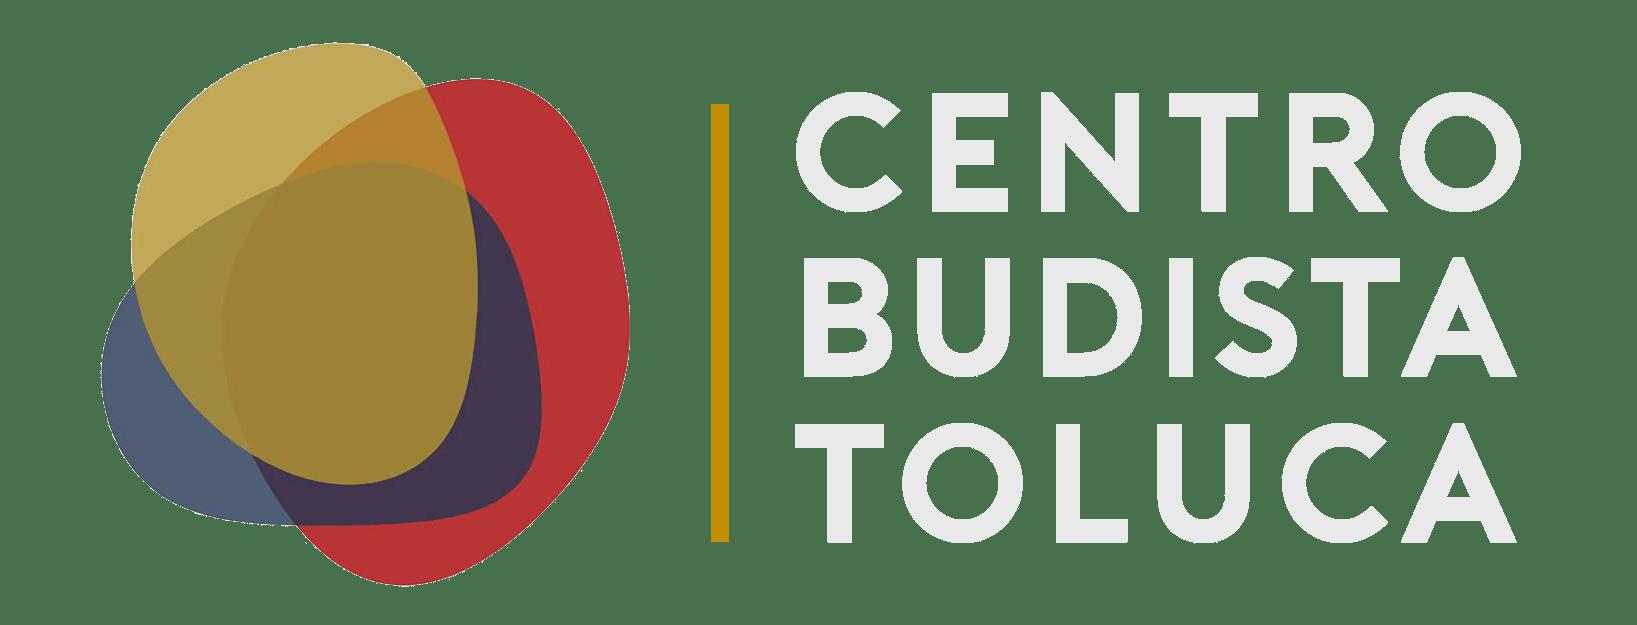 Centro Budista de Toluca